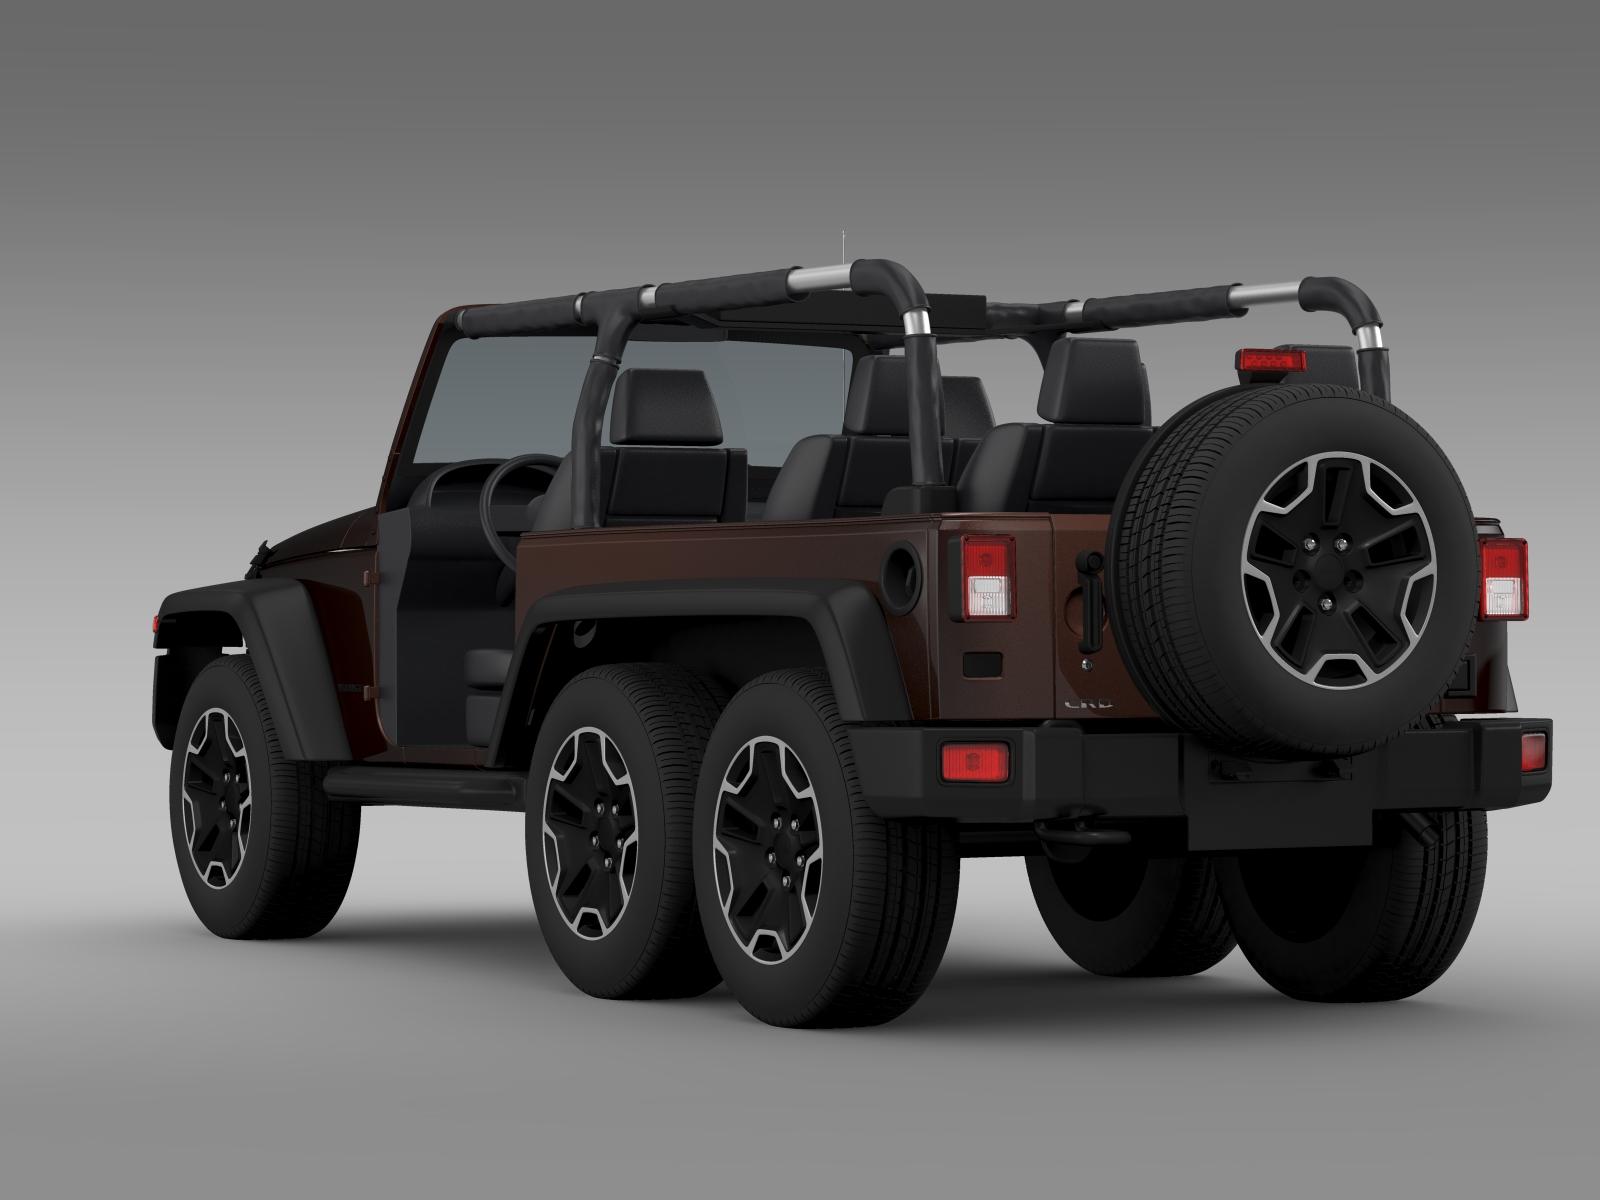 jeep wrangler rubicon 6x6 2016 3d model buy jeep. Black Bedroom Furniture Sets. Home Design Ideas